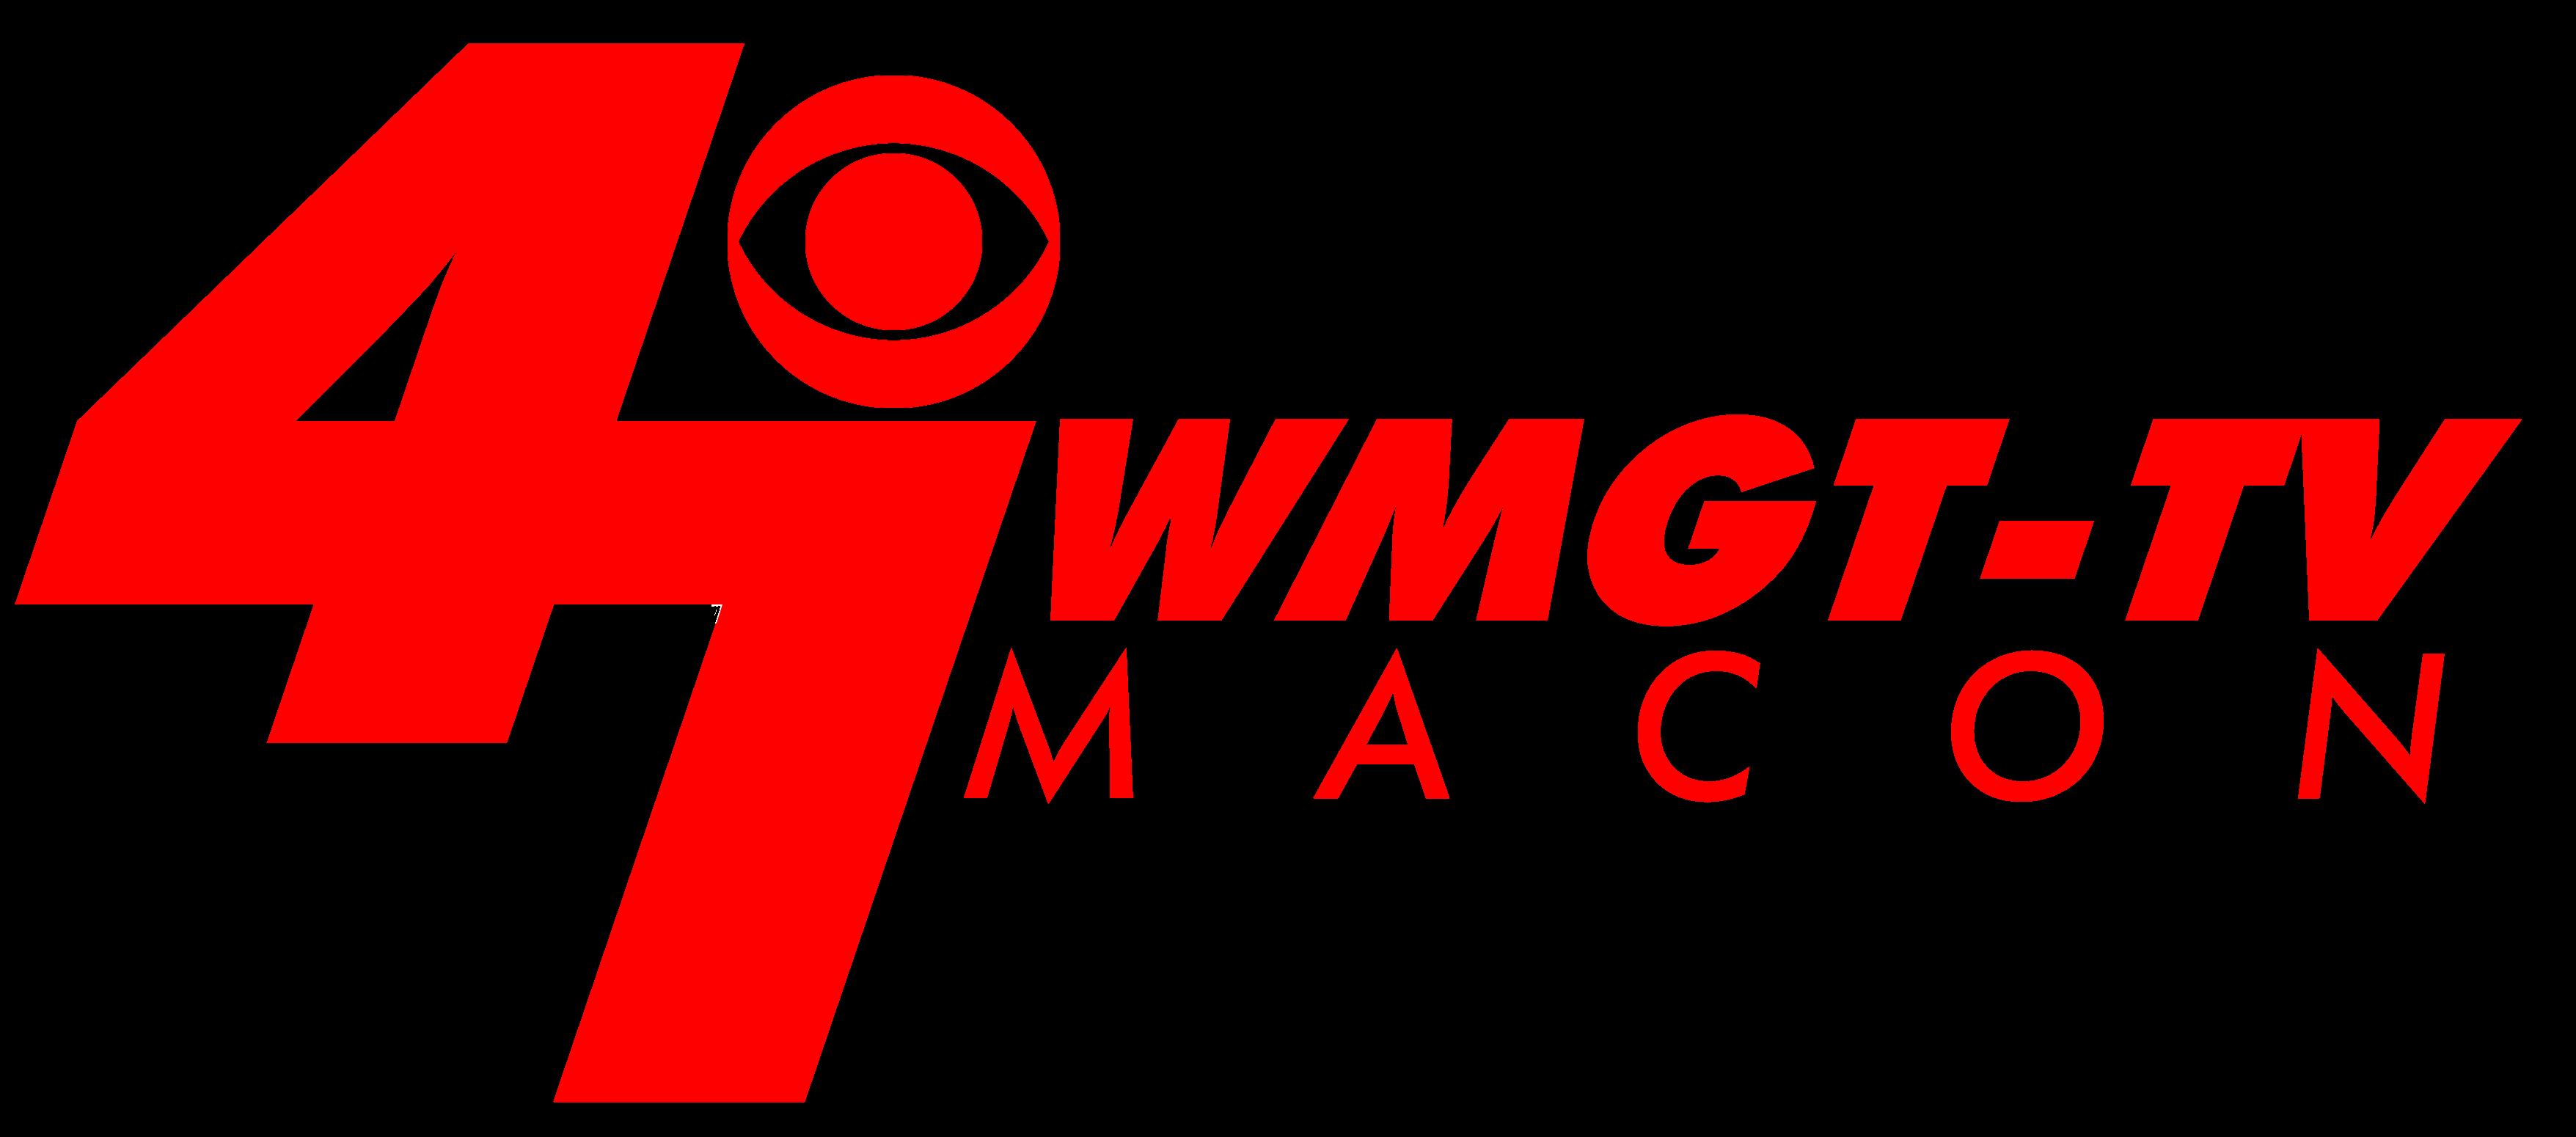 AlternateHistory.com's WMGT logo #1.png